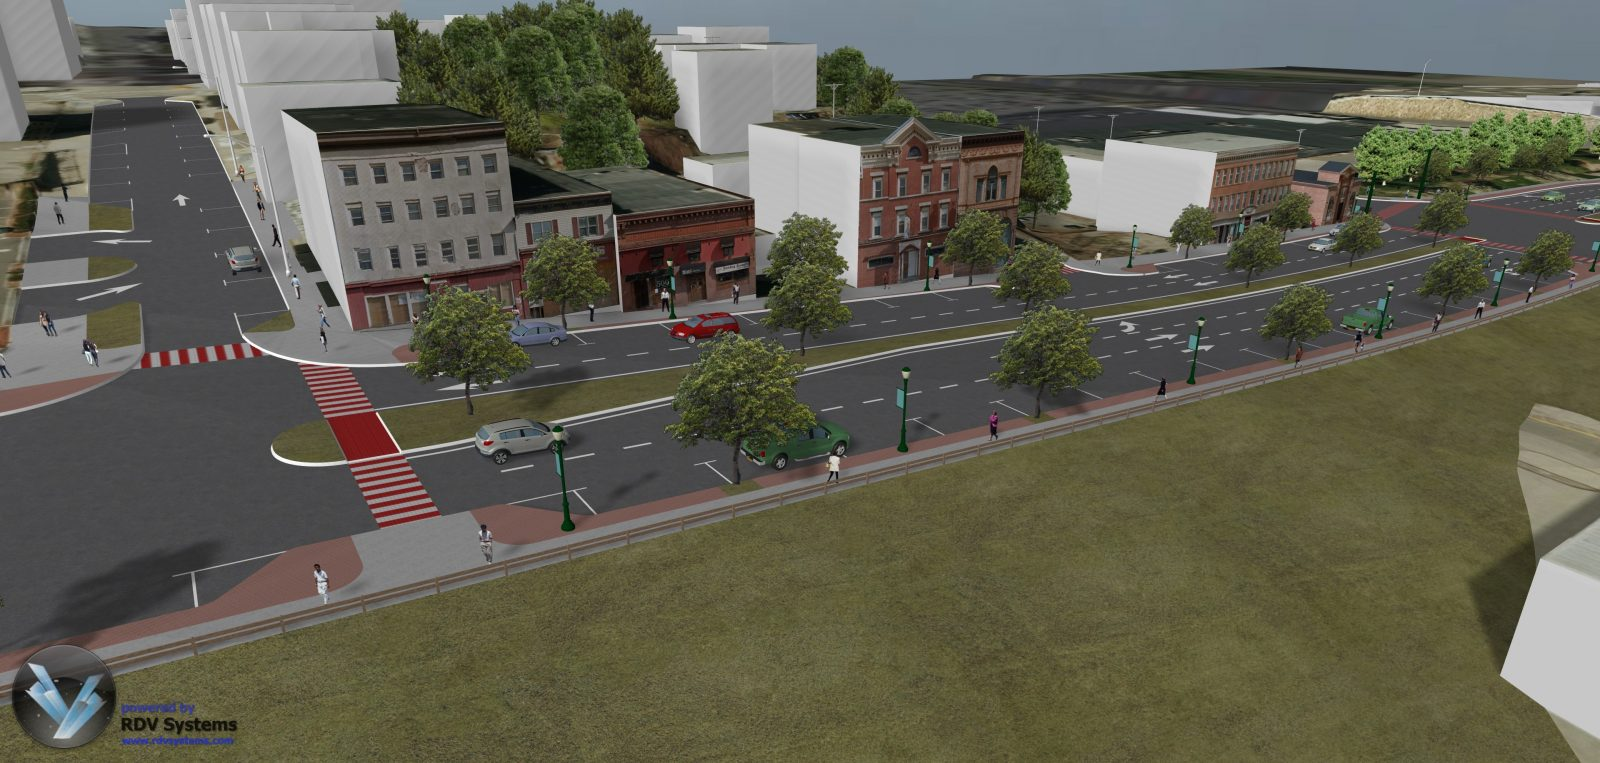 RDV Systems - Derby Main Street 3